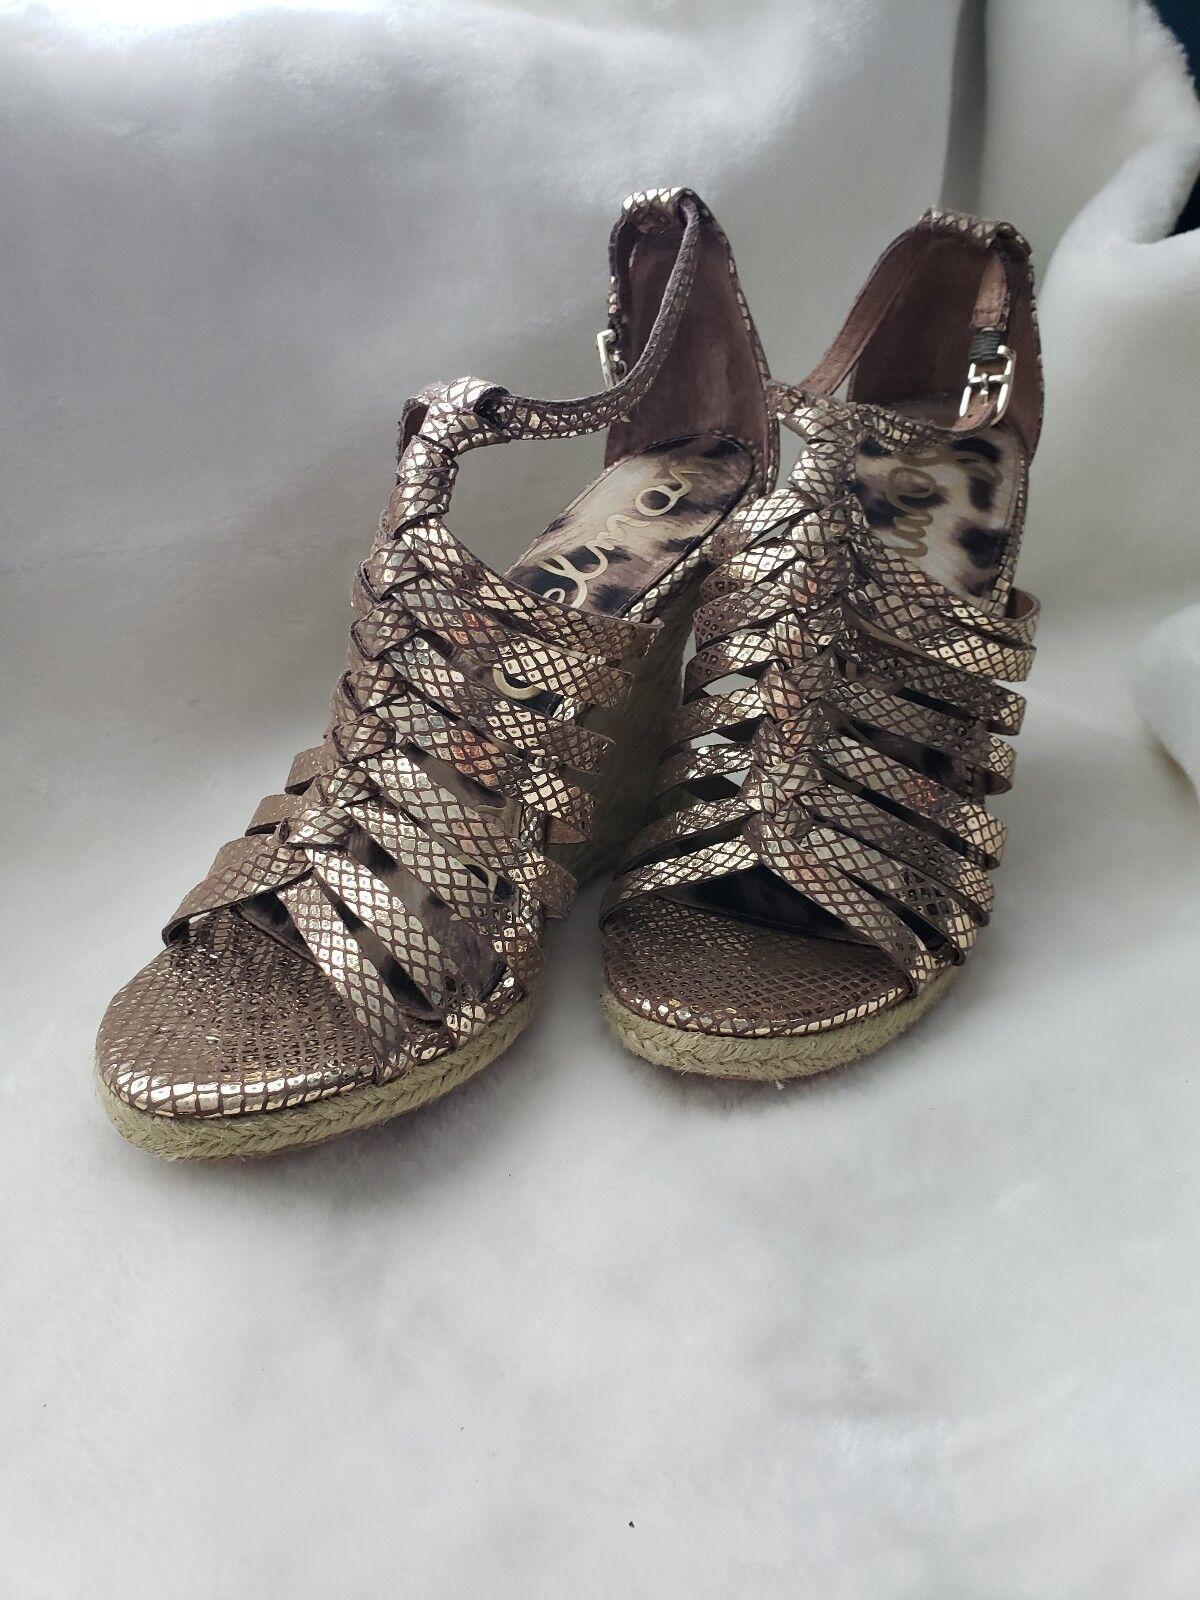 NWOB Sam Edelman Egyptian gold Sandal Wedges Size US 8.5